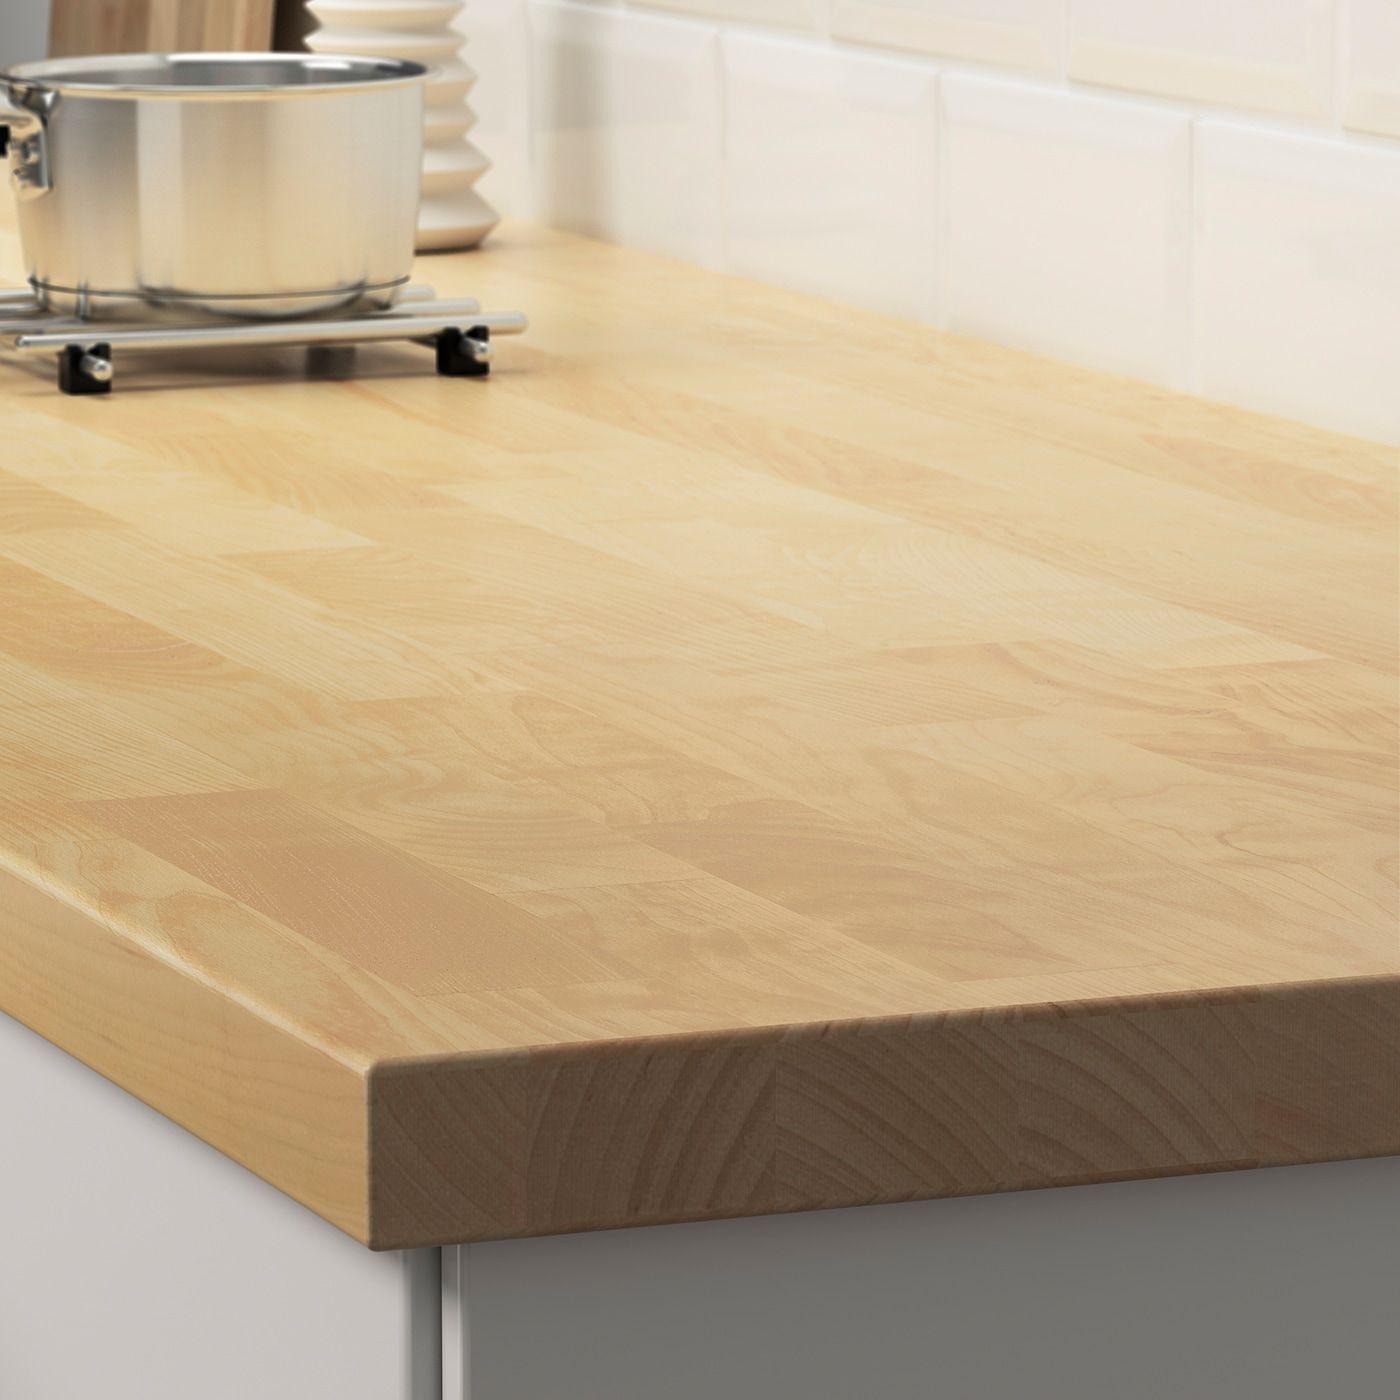 Karlby Arbeitsplatte Birke Furnier Ikea Osterreich In 2020 Karlby Countertop Wood Countertops Countertops